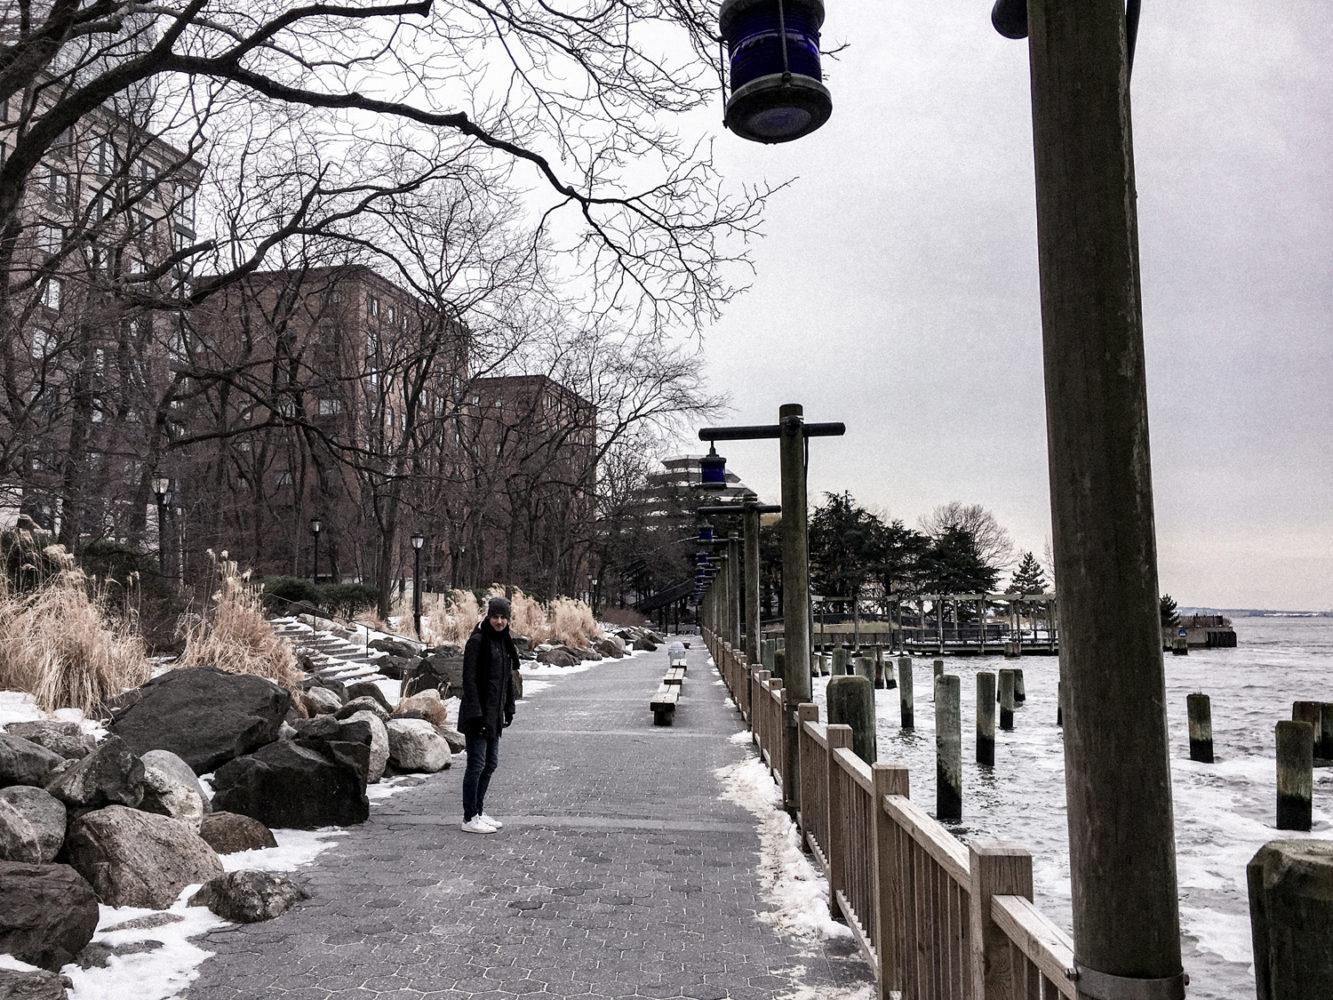 Balade le long de l'Hudson River